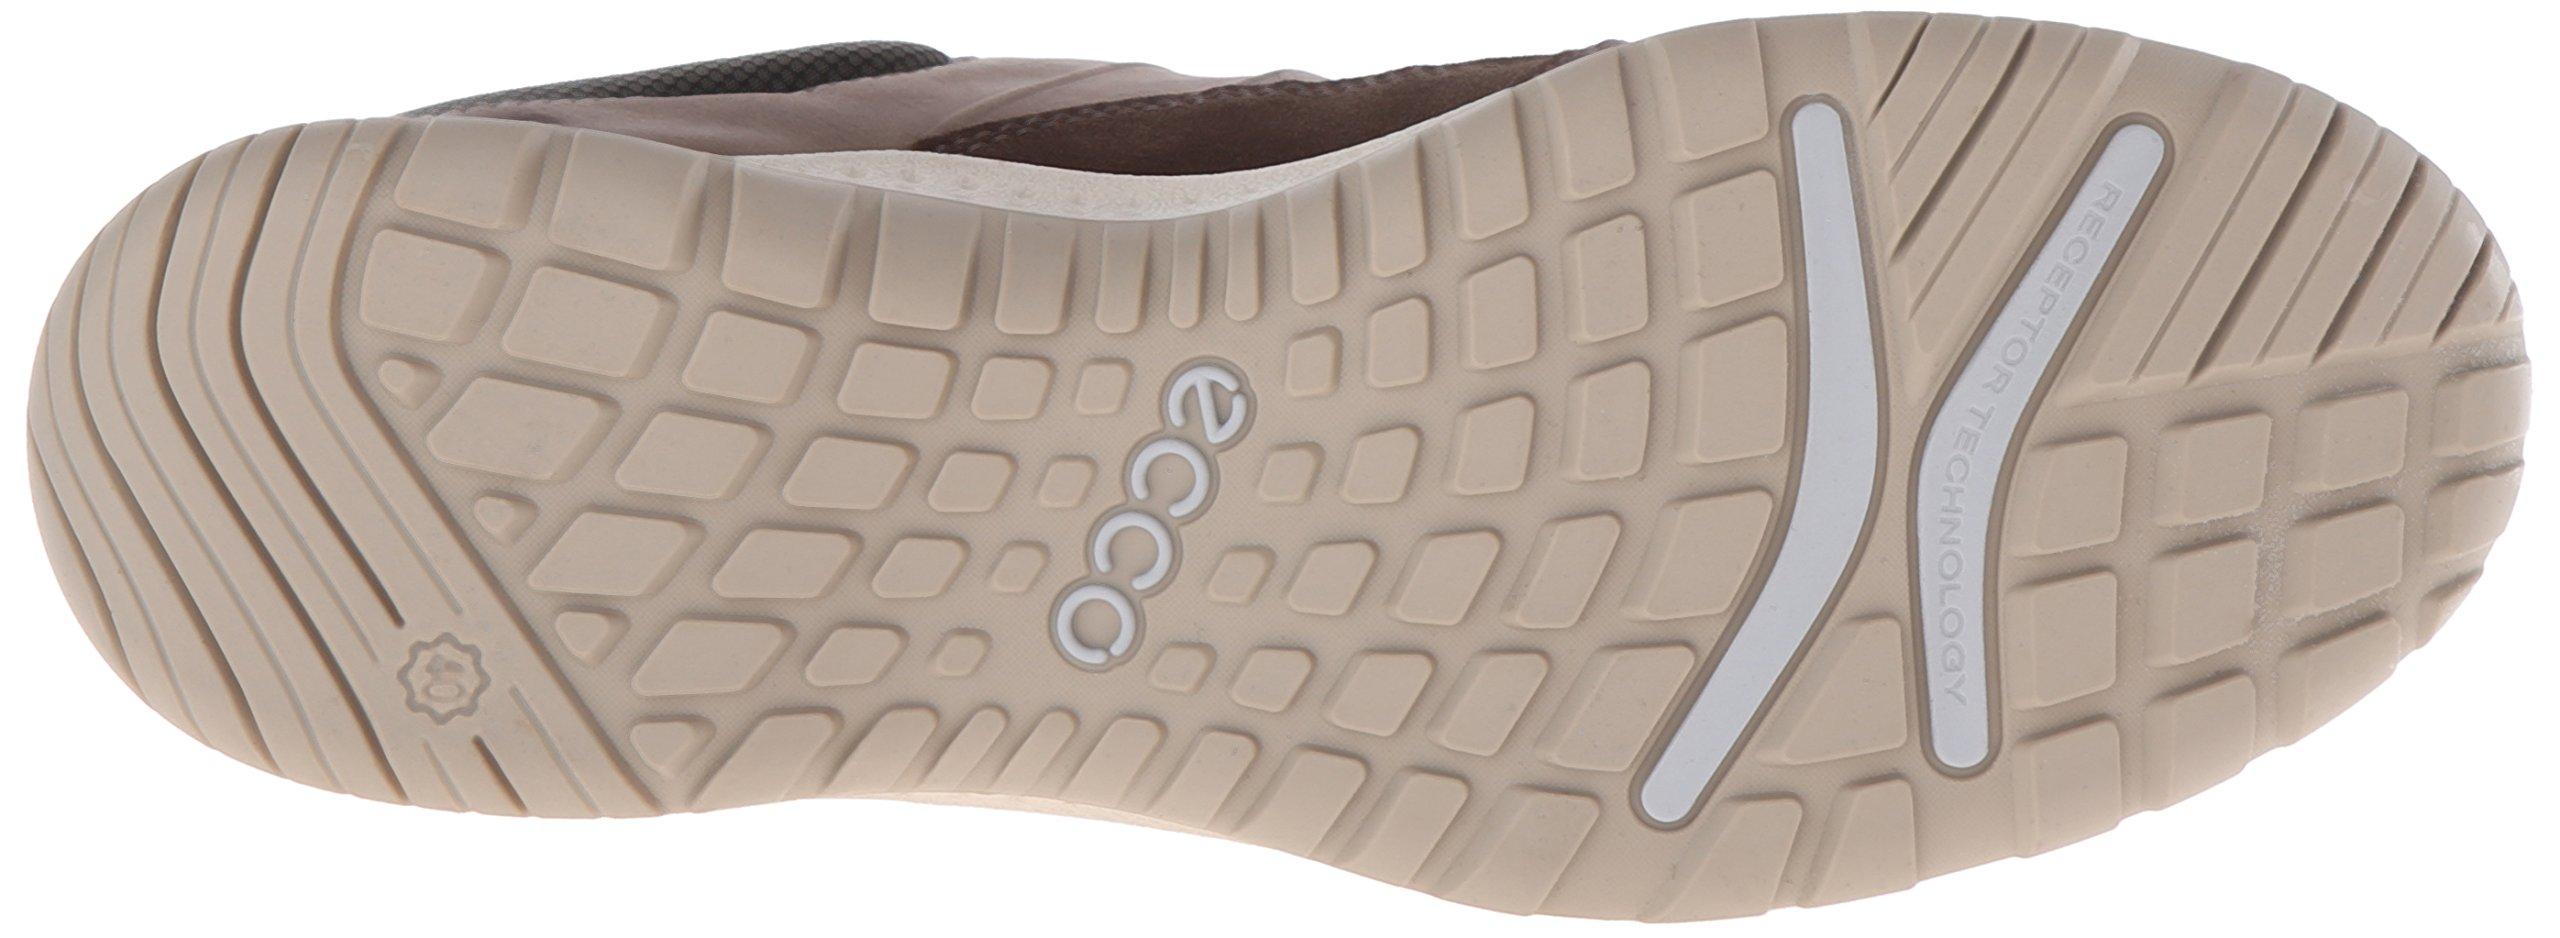 71fVgxeOGuL - ECCO Women's Aspina Multisport Outdoor Shoes